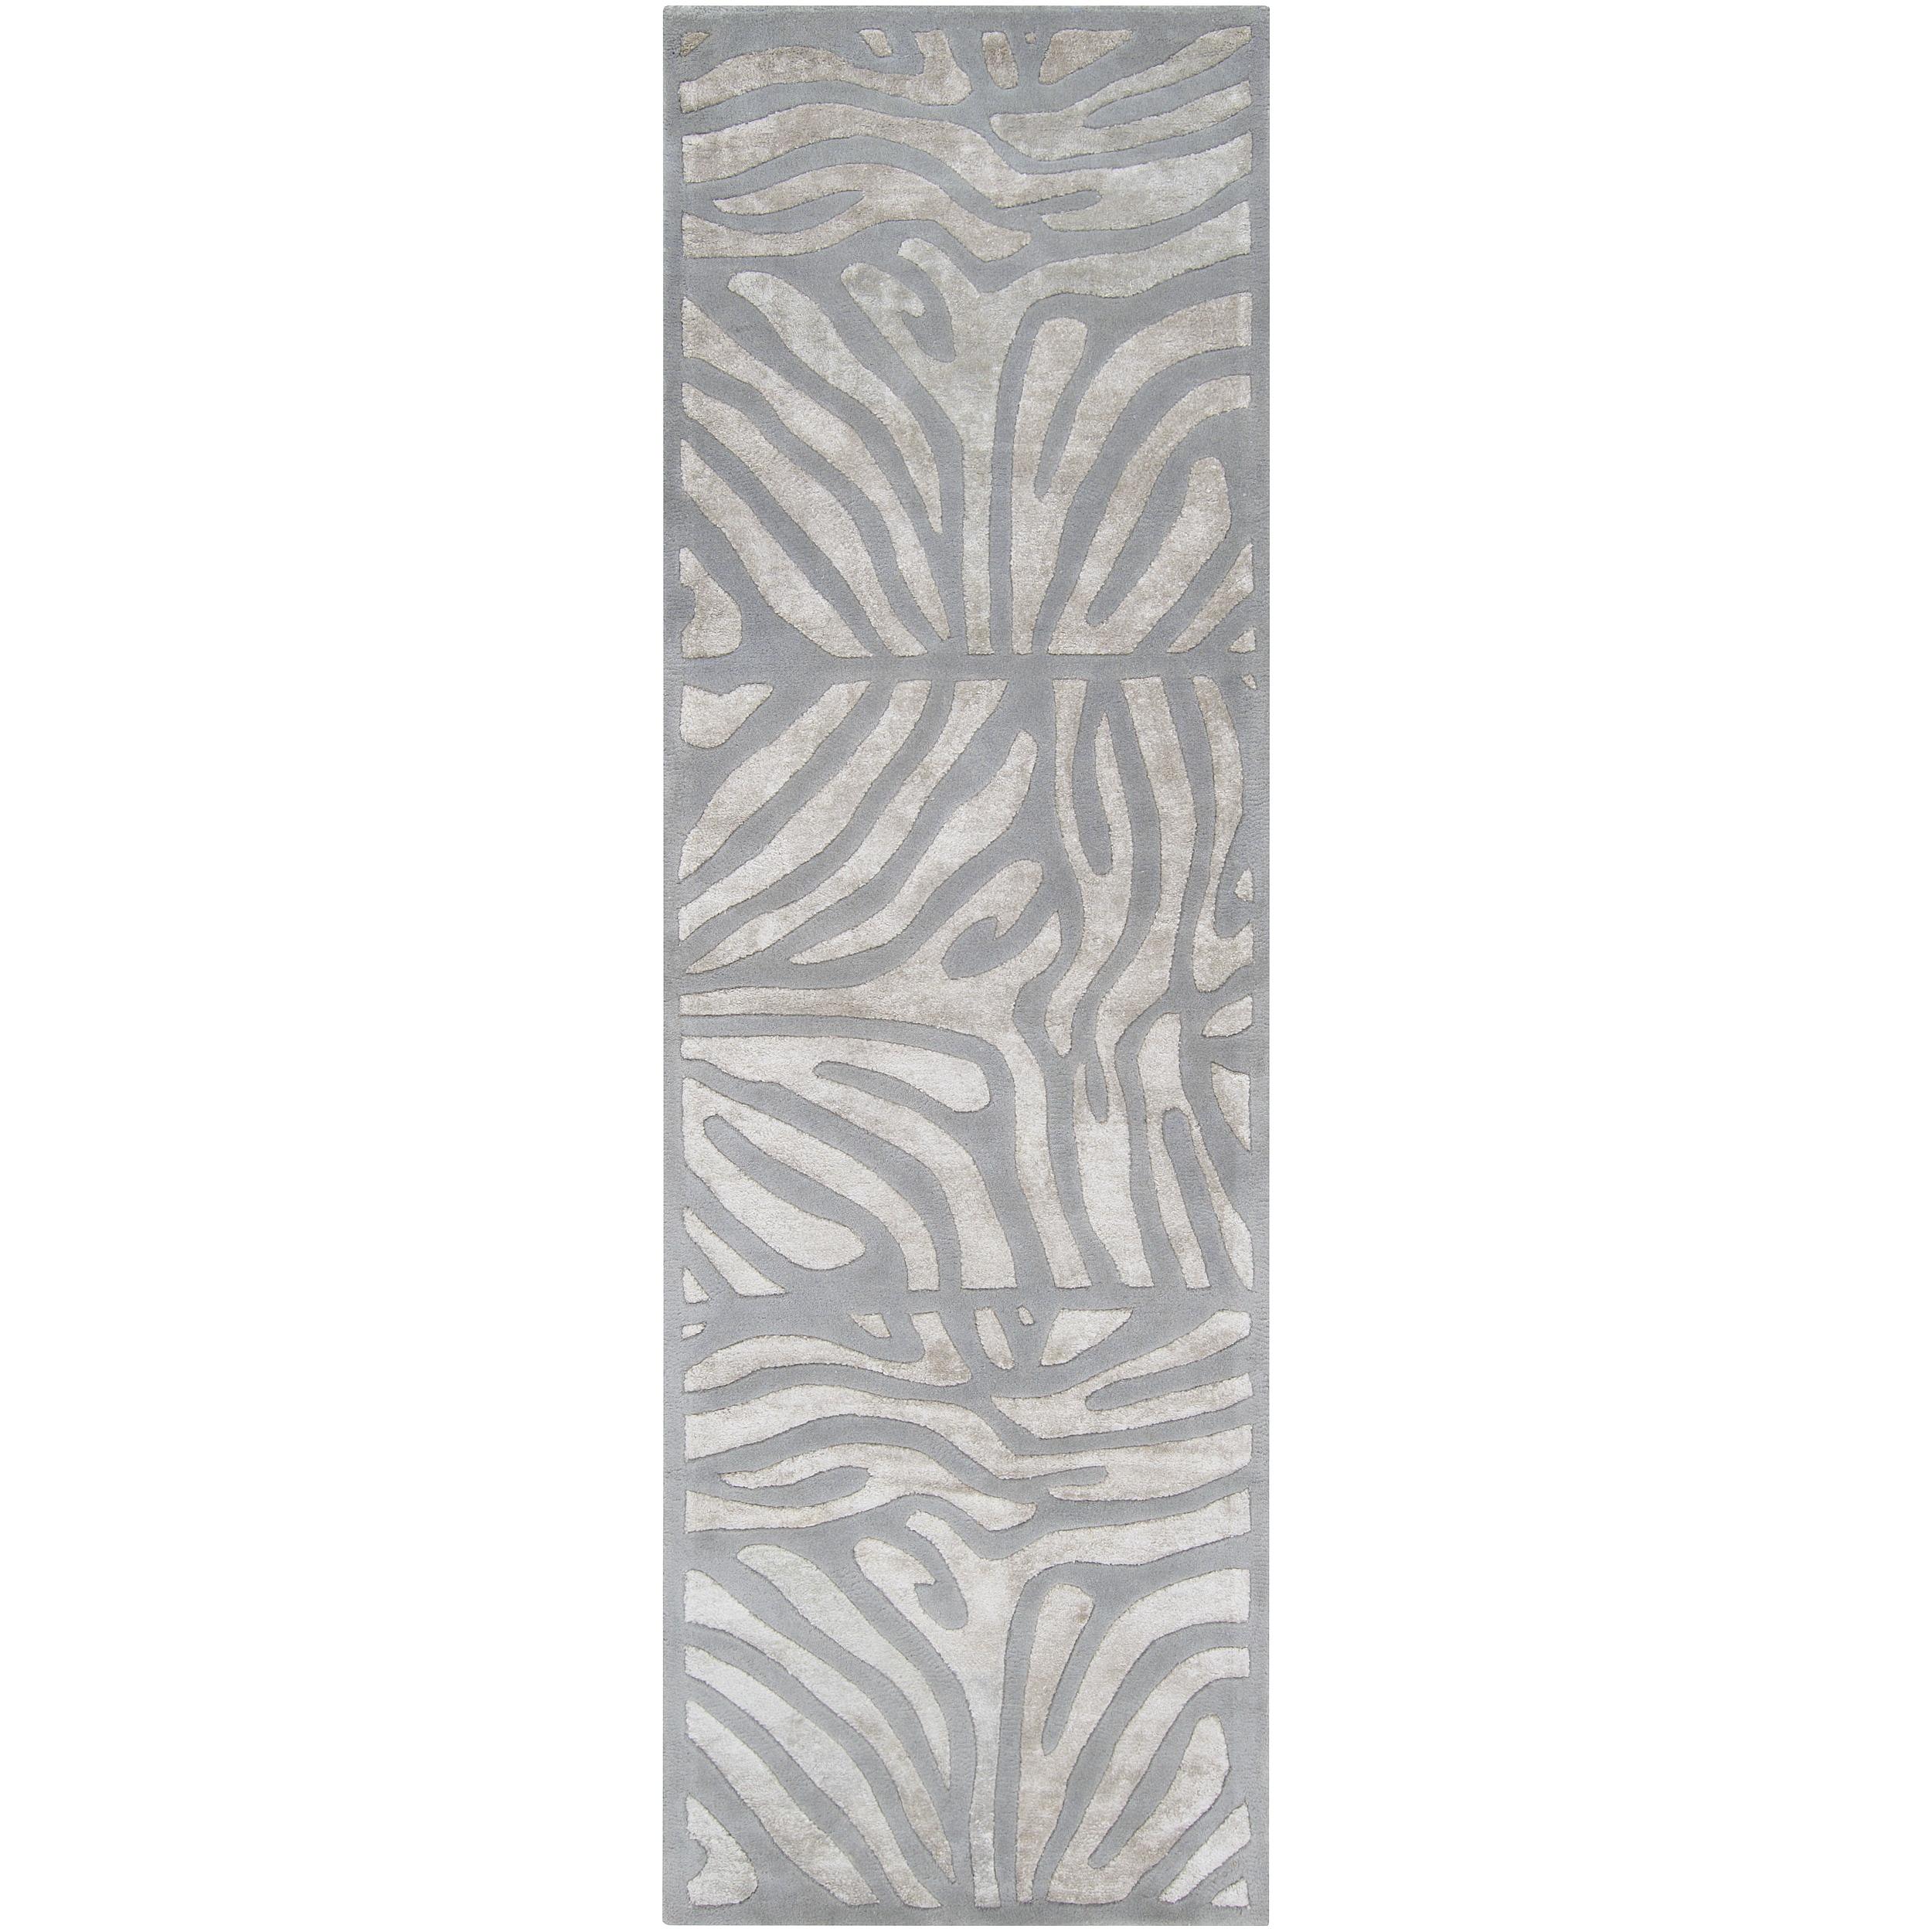 Hand-tufted Grey Zebra Animal Print Dali Wool Area Rug (2'6 x 8')